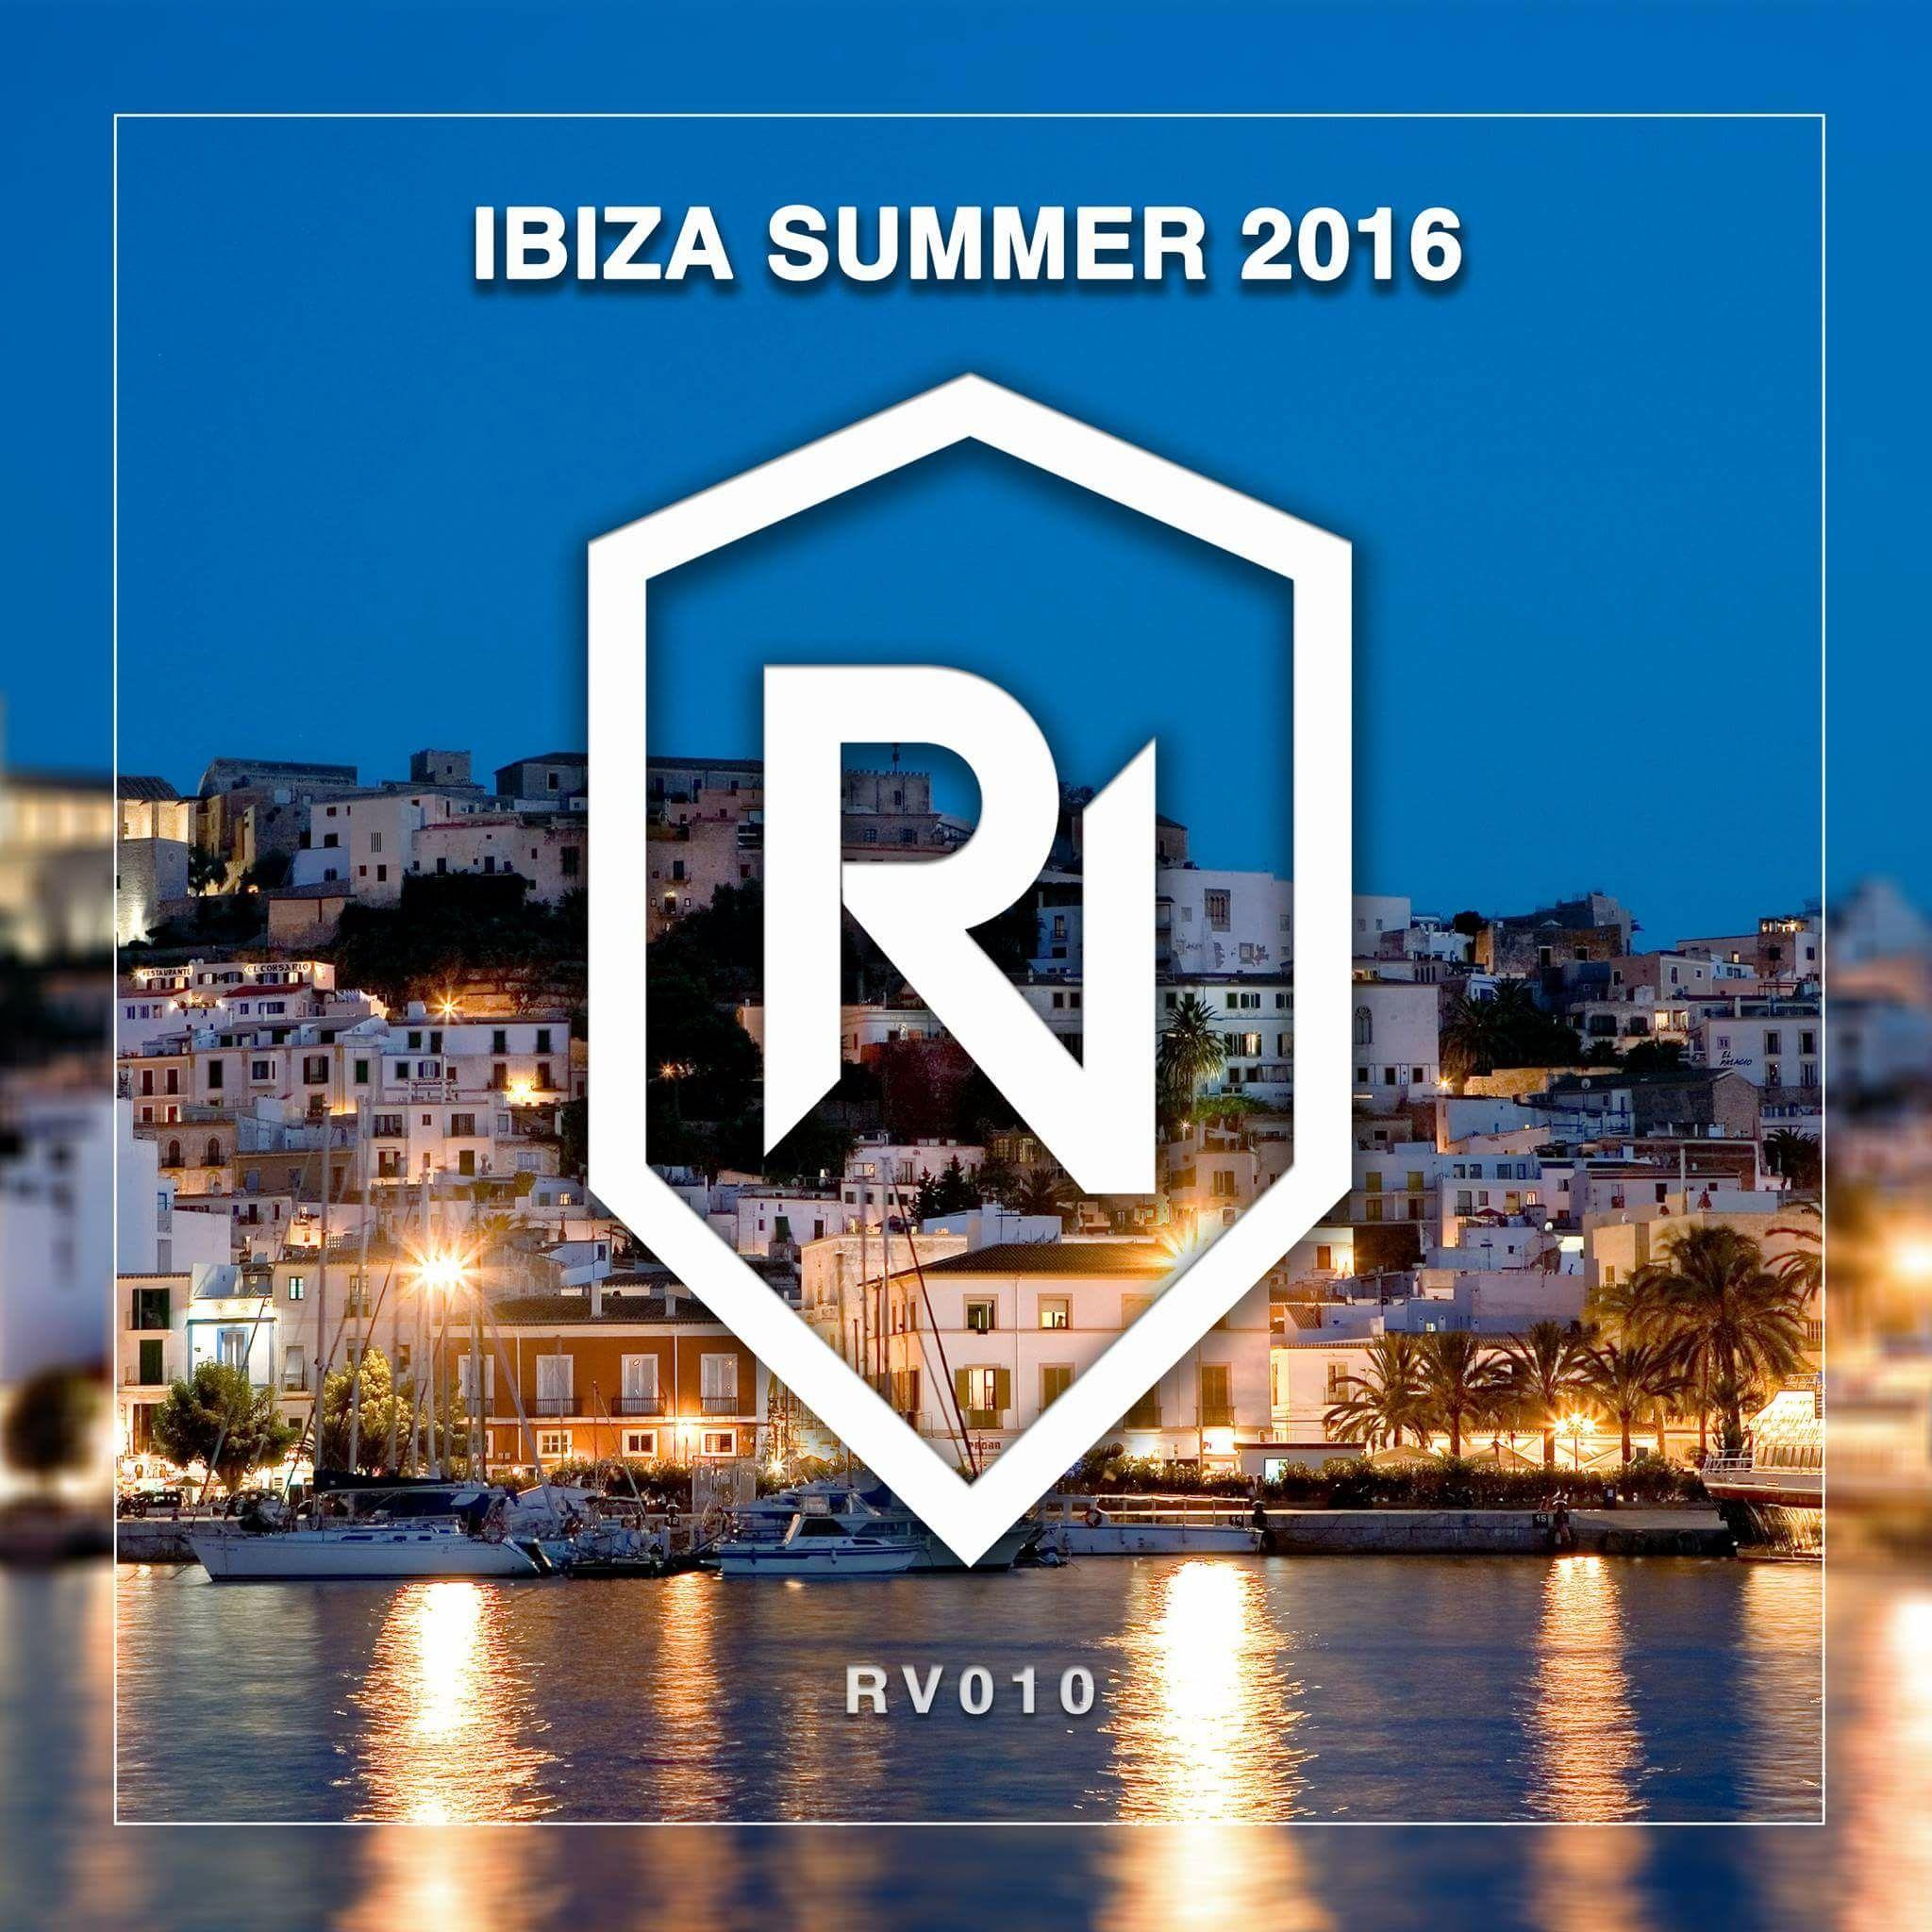 rey_vercosa_and_friends_-_ibiza_summer_2016.jpg